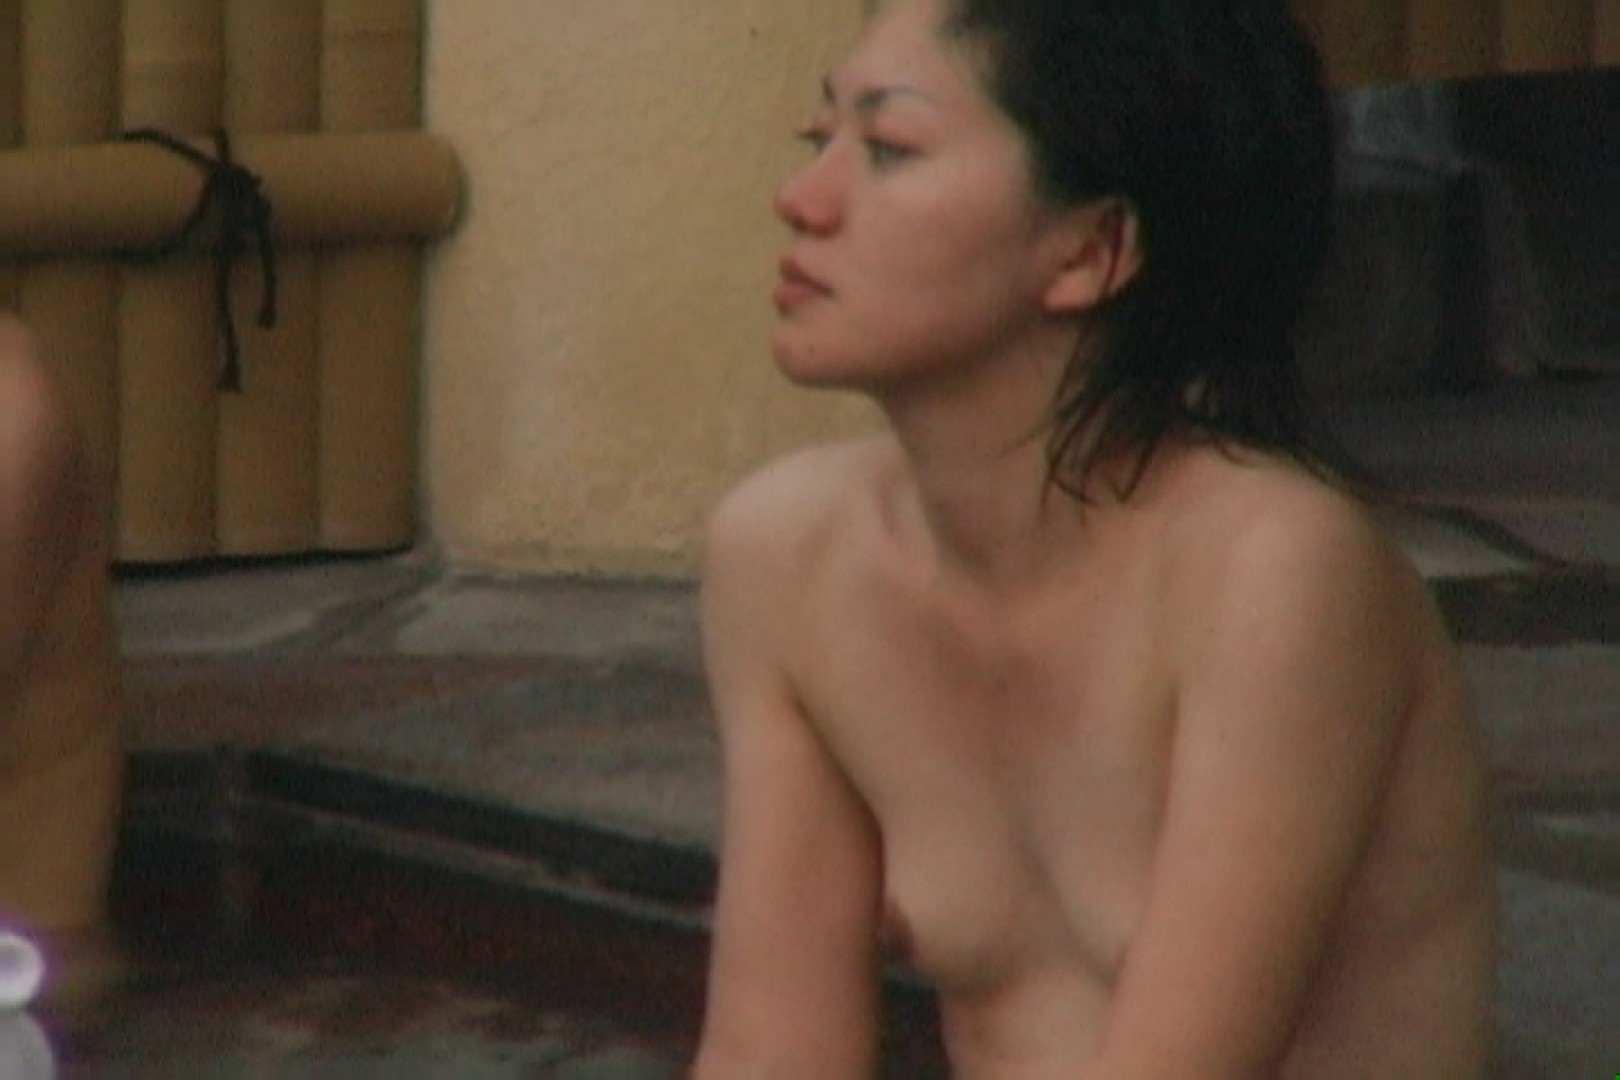 Aquaな露天風呂Vol.613 OL女体  43連発 9